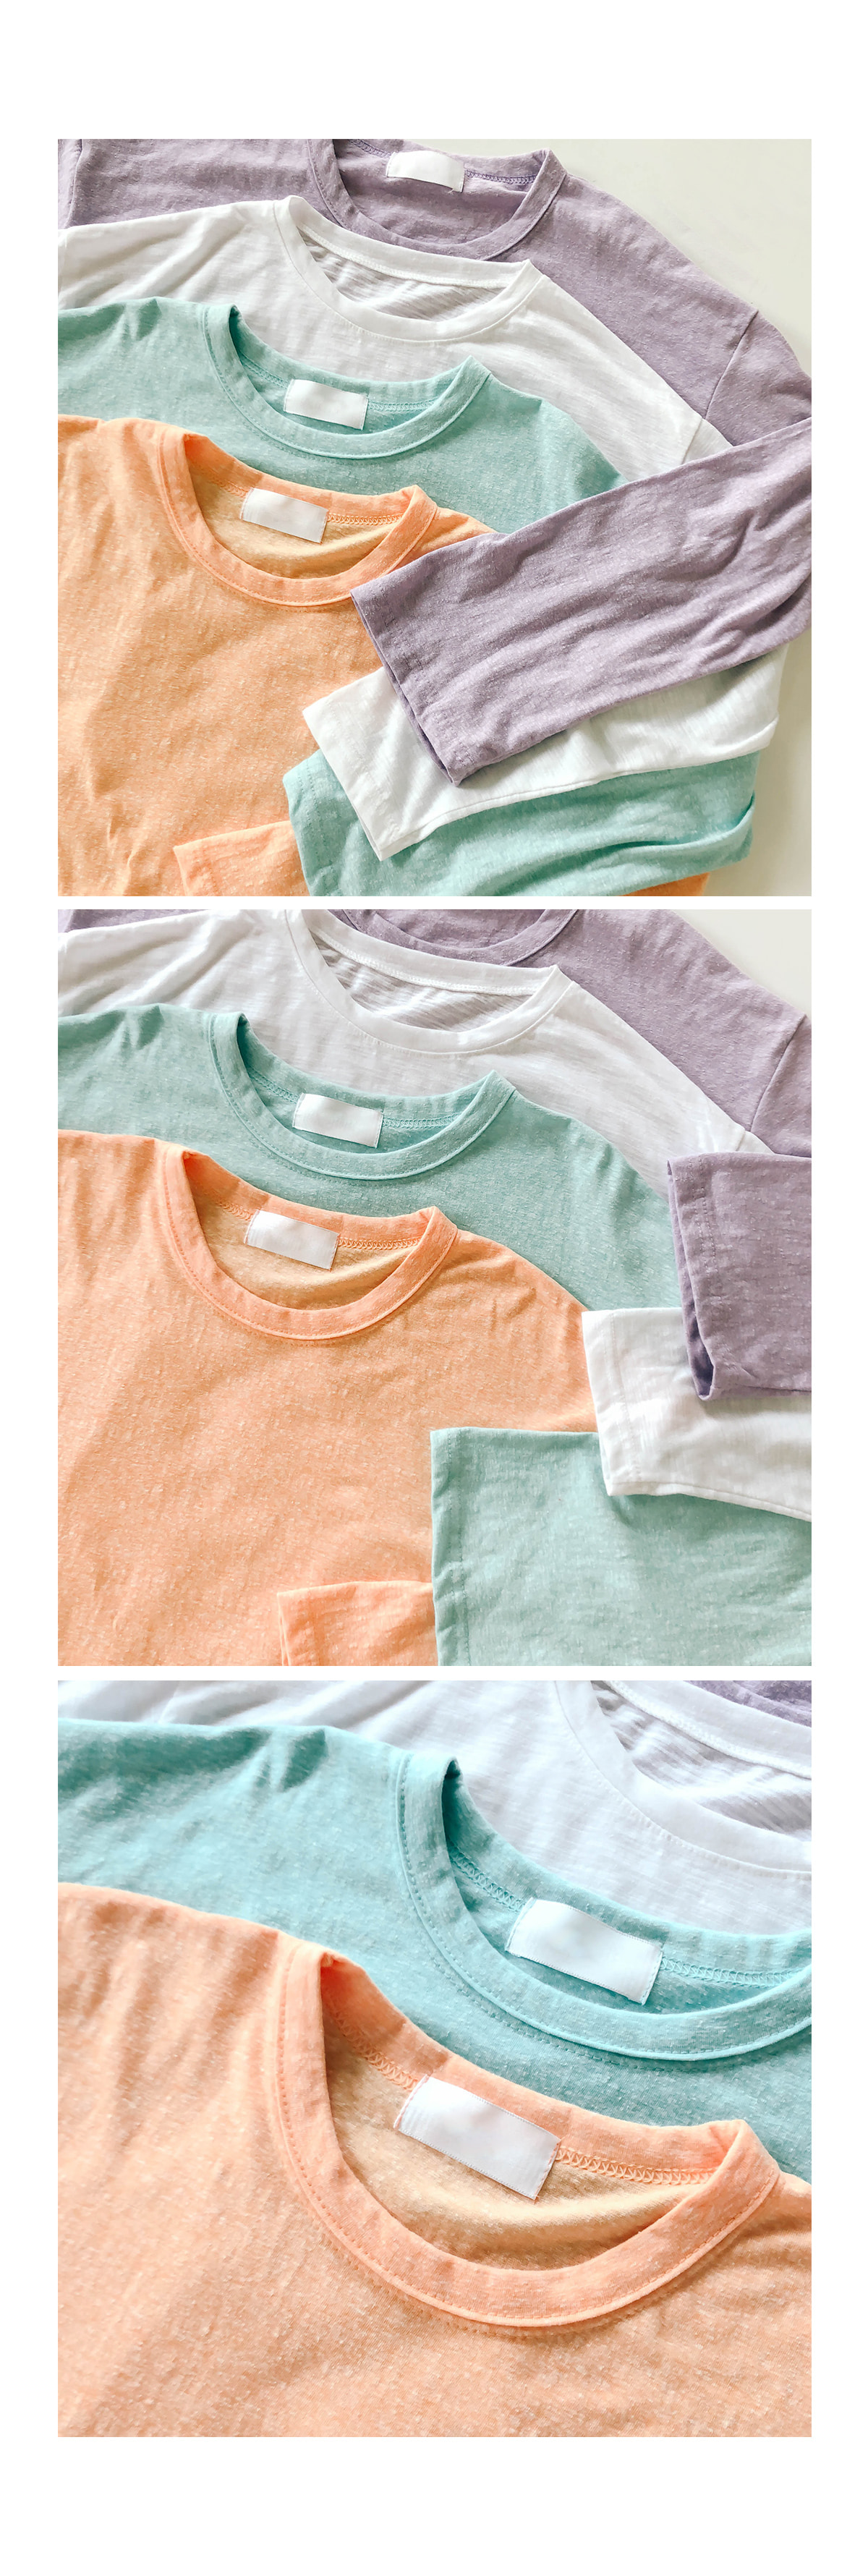 Slavequez Summer Long Sleeve T-shirt